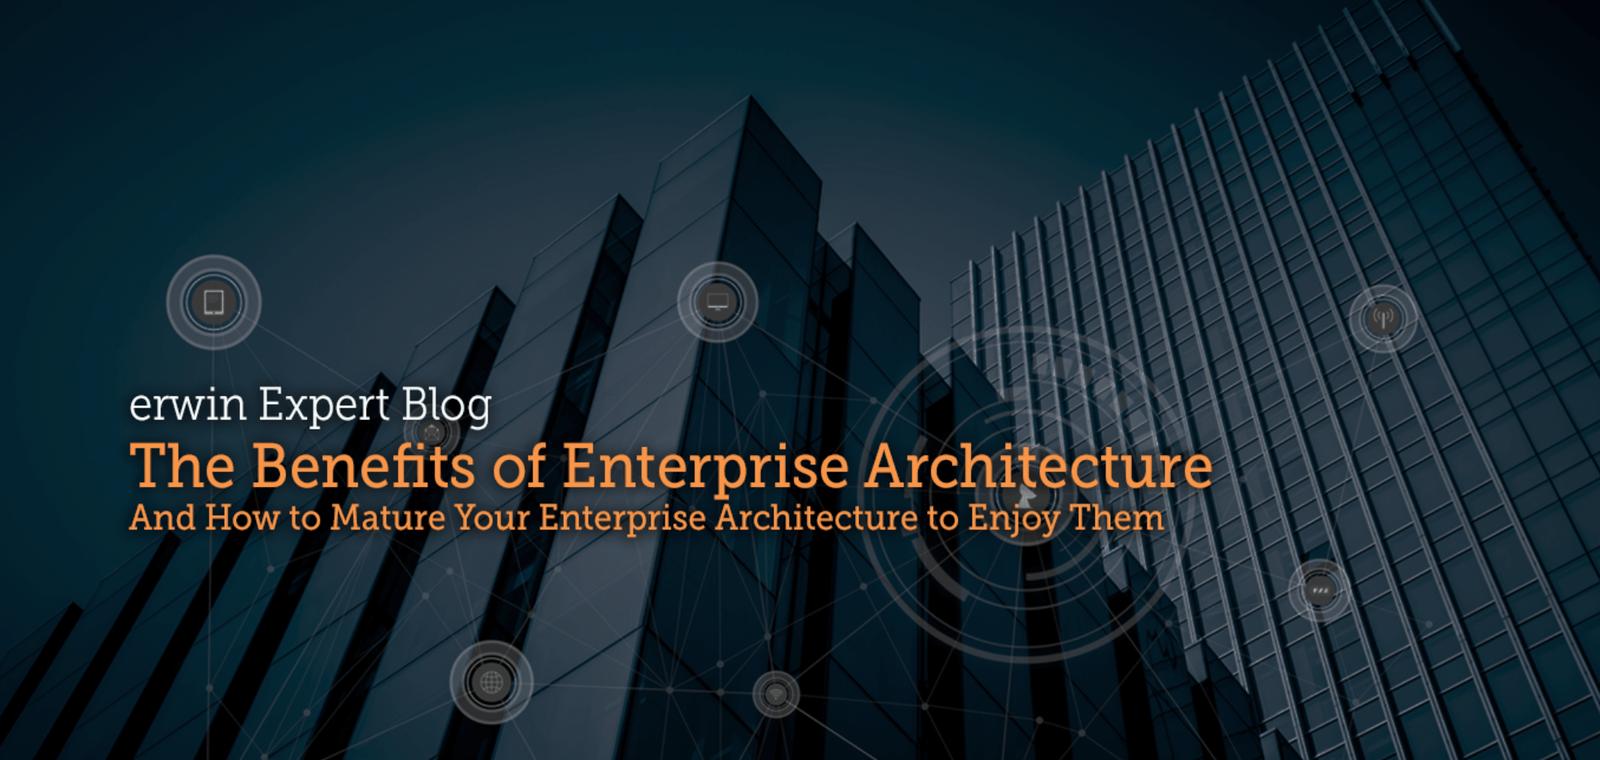 Top 3 Benefits of Enterprise Architecture